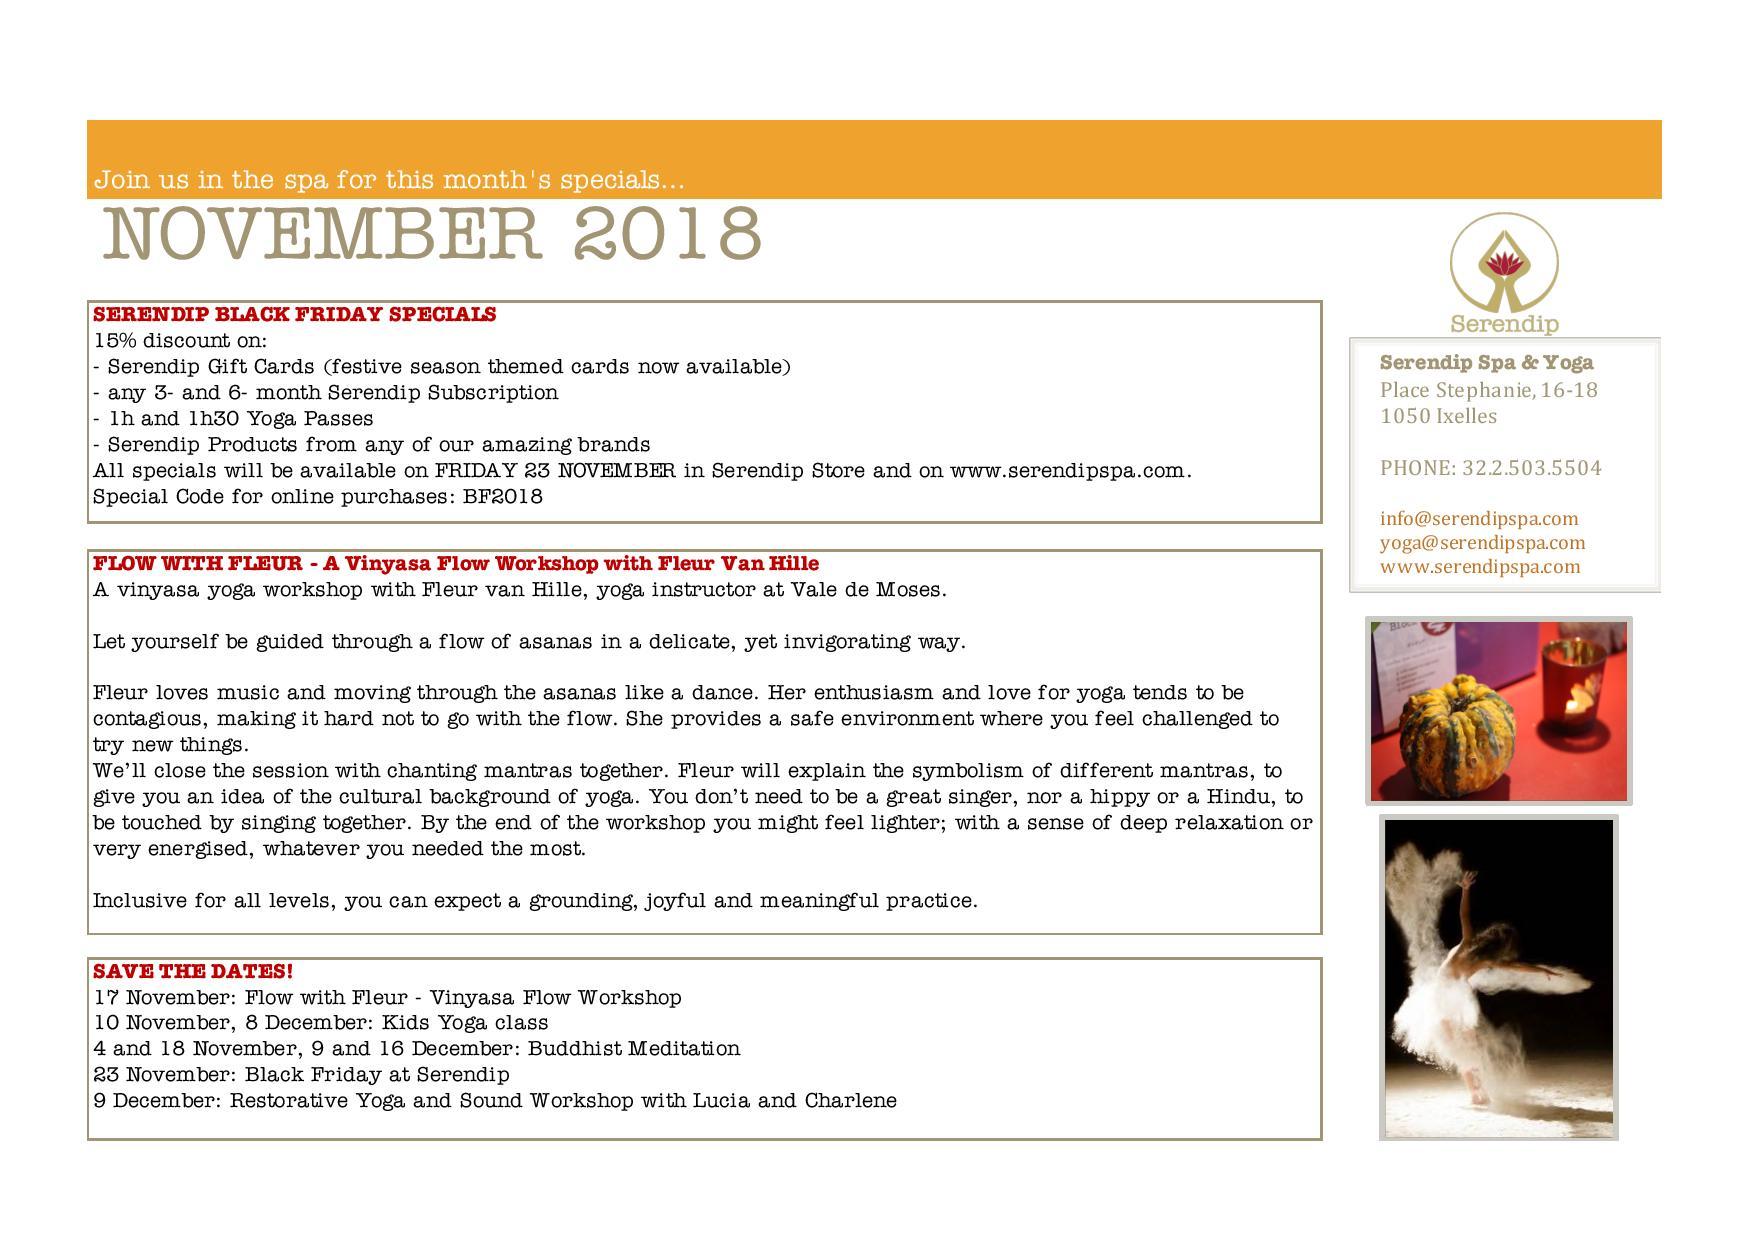 serendip spa and yoga calendar 2018_November A4 BACK-page-001.jpg